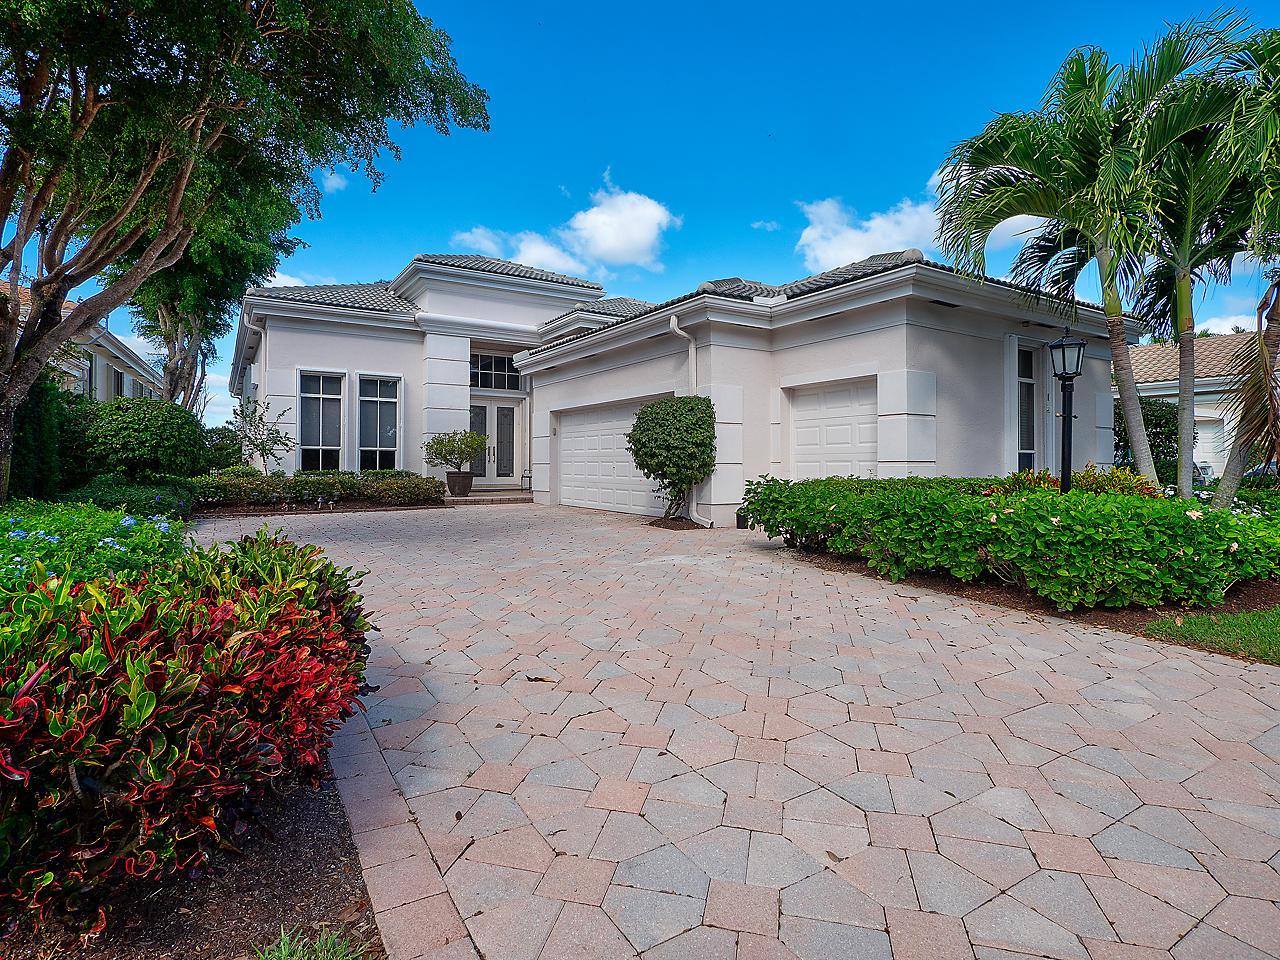 281 Isle Way, Palm Beach Gardens, Florida 33418, 3 Bedrooms Bedrooms, ,2 BathroomsBathrooms,A,Single family,Isle,RX-10589151